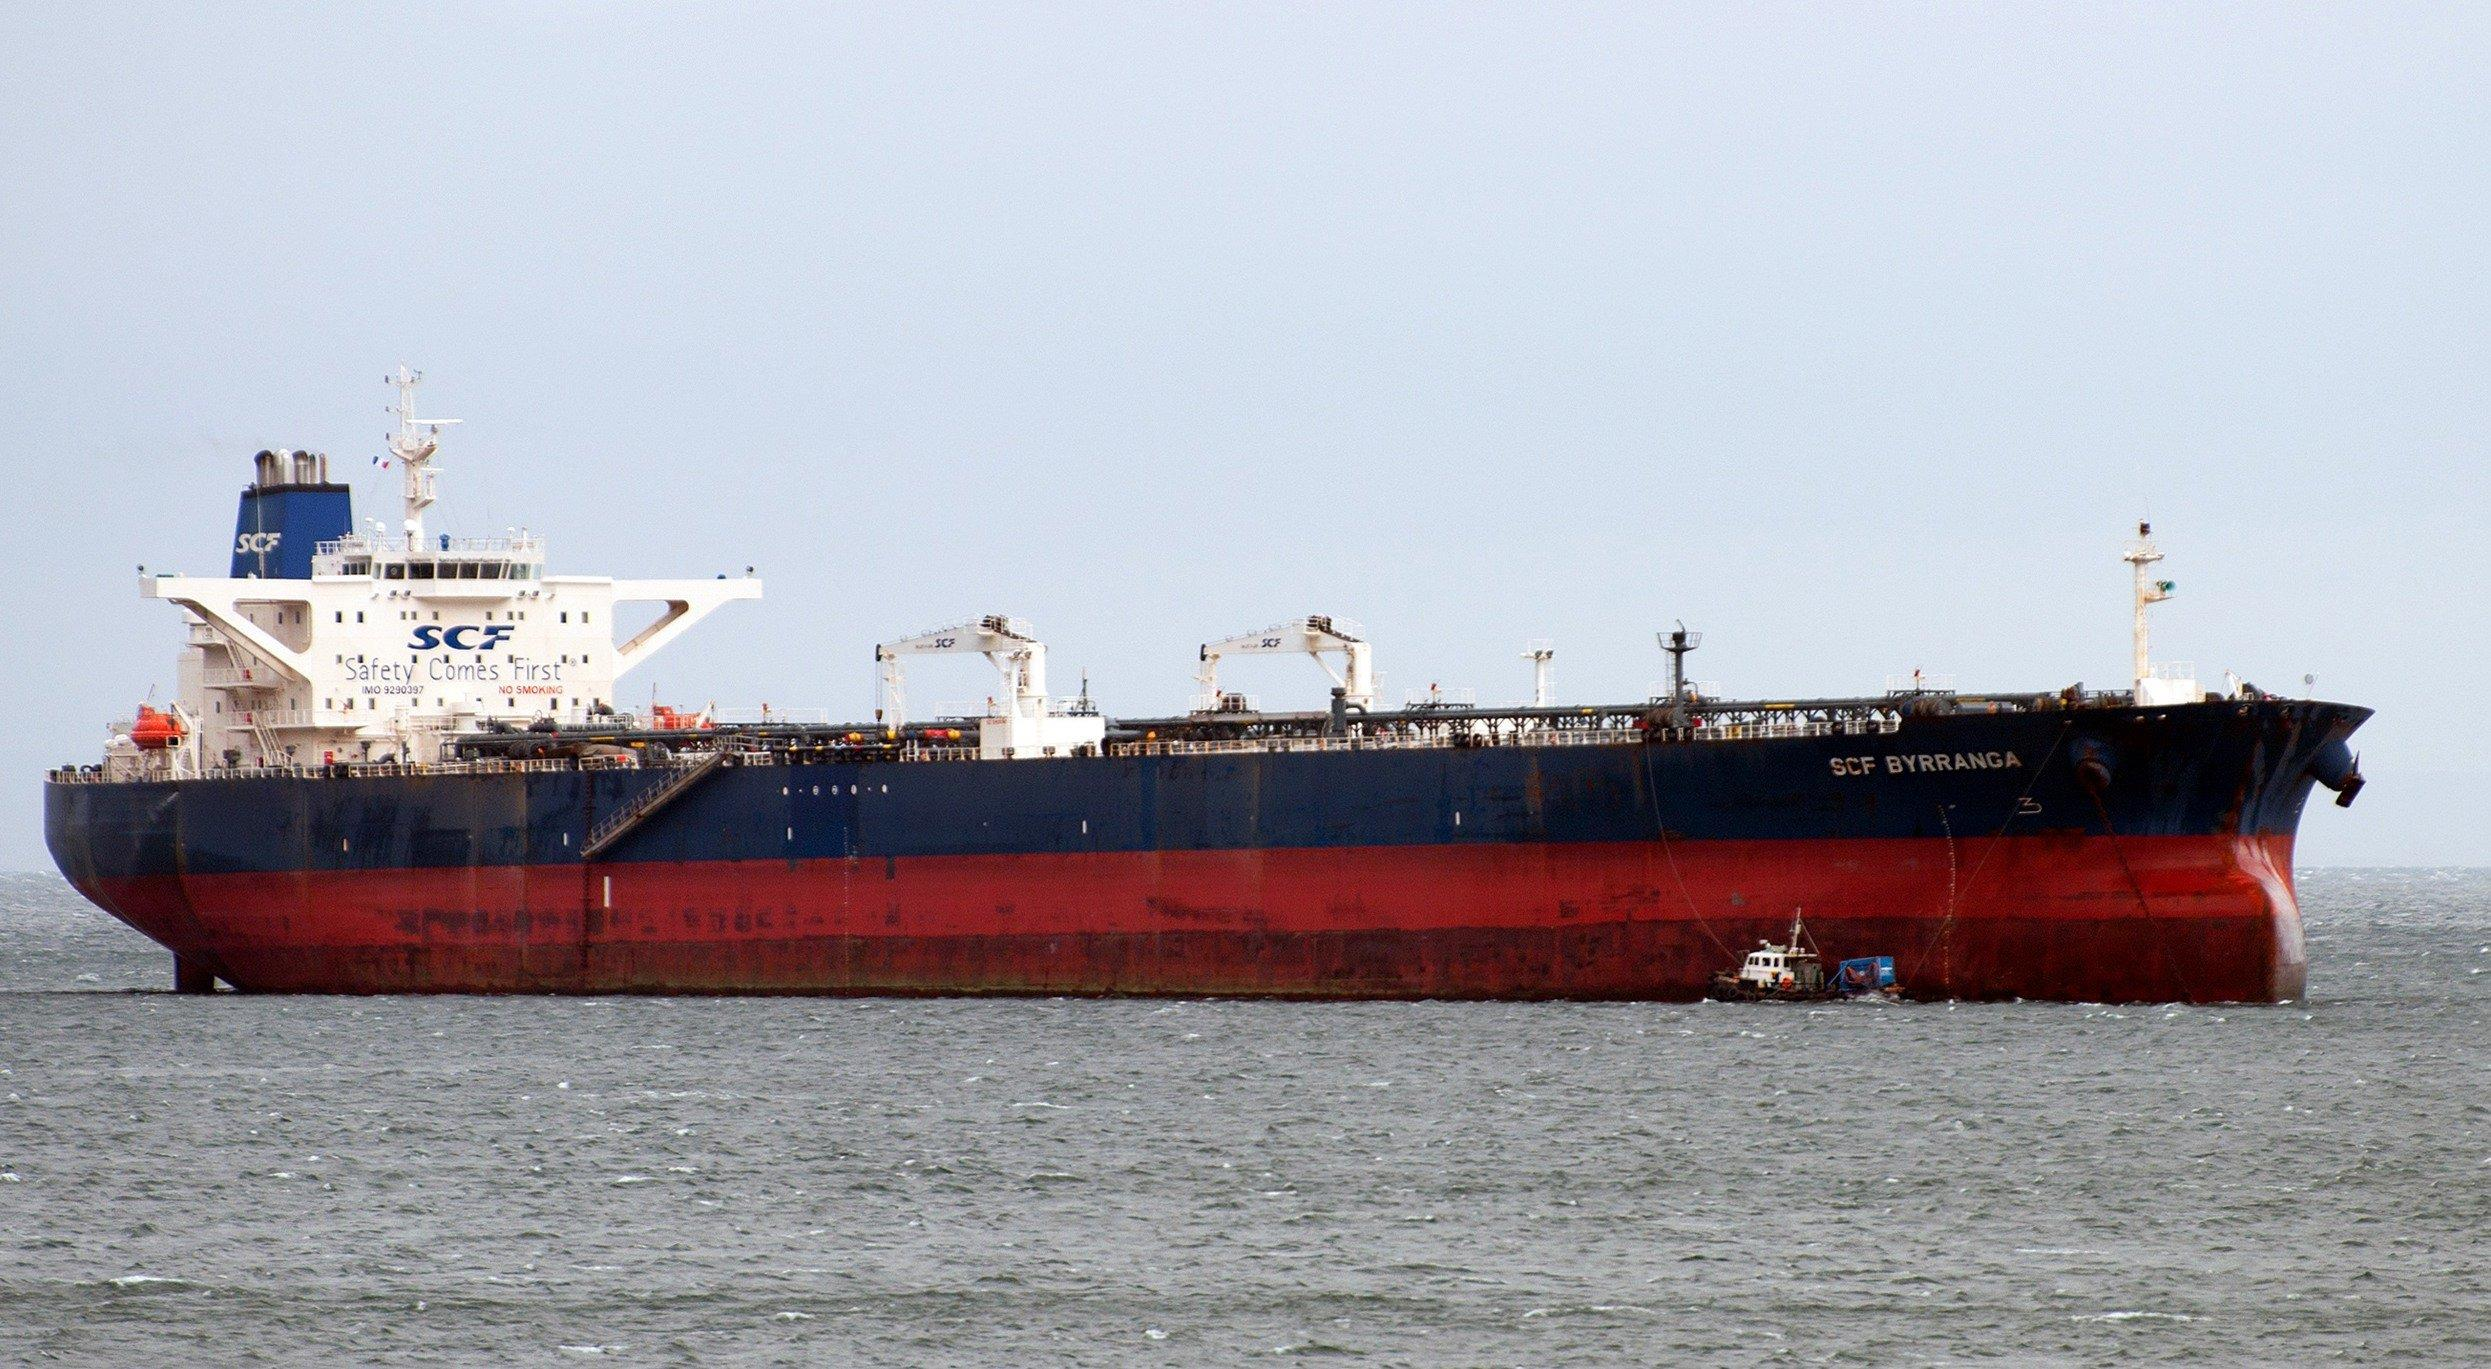 Image: The oil tanker United Kalavrvta